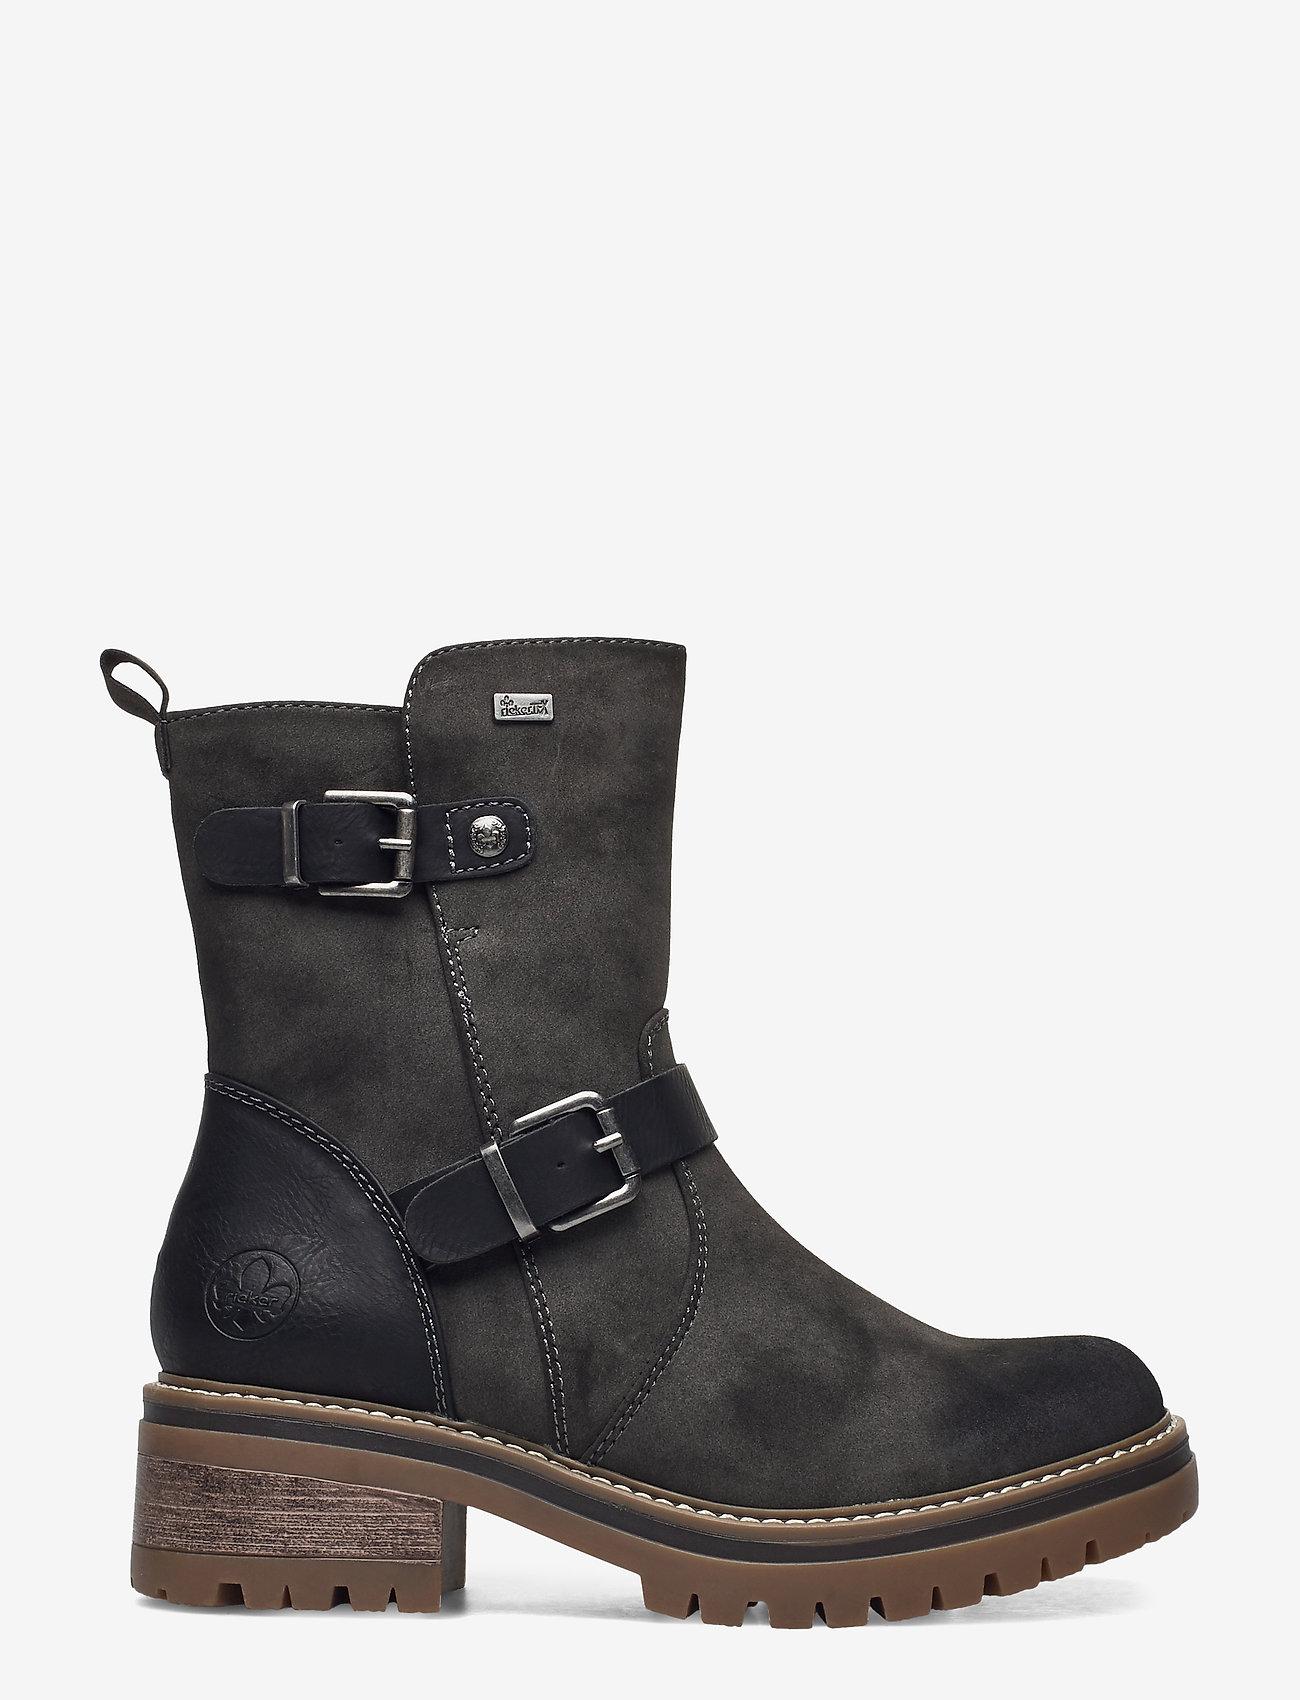 96274-45 (Grey) (89.95 €) - Rieker U3khv